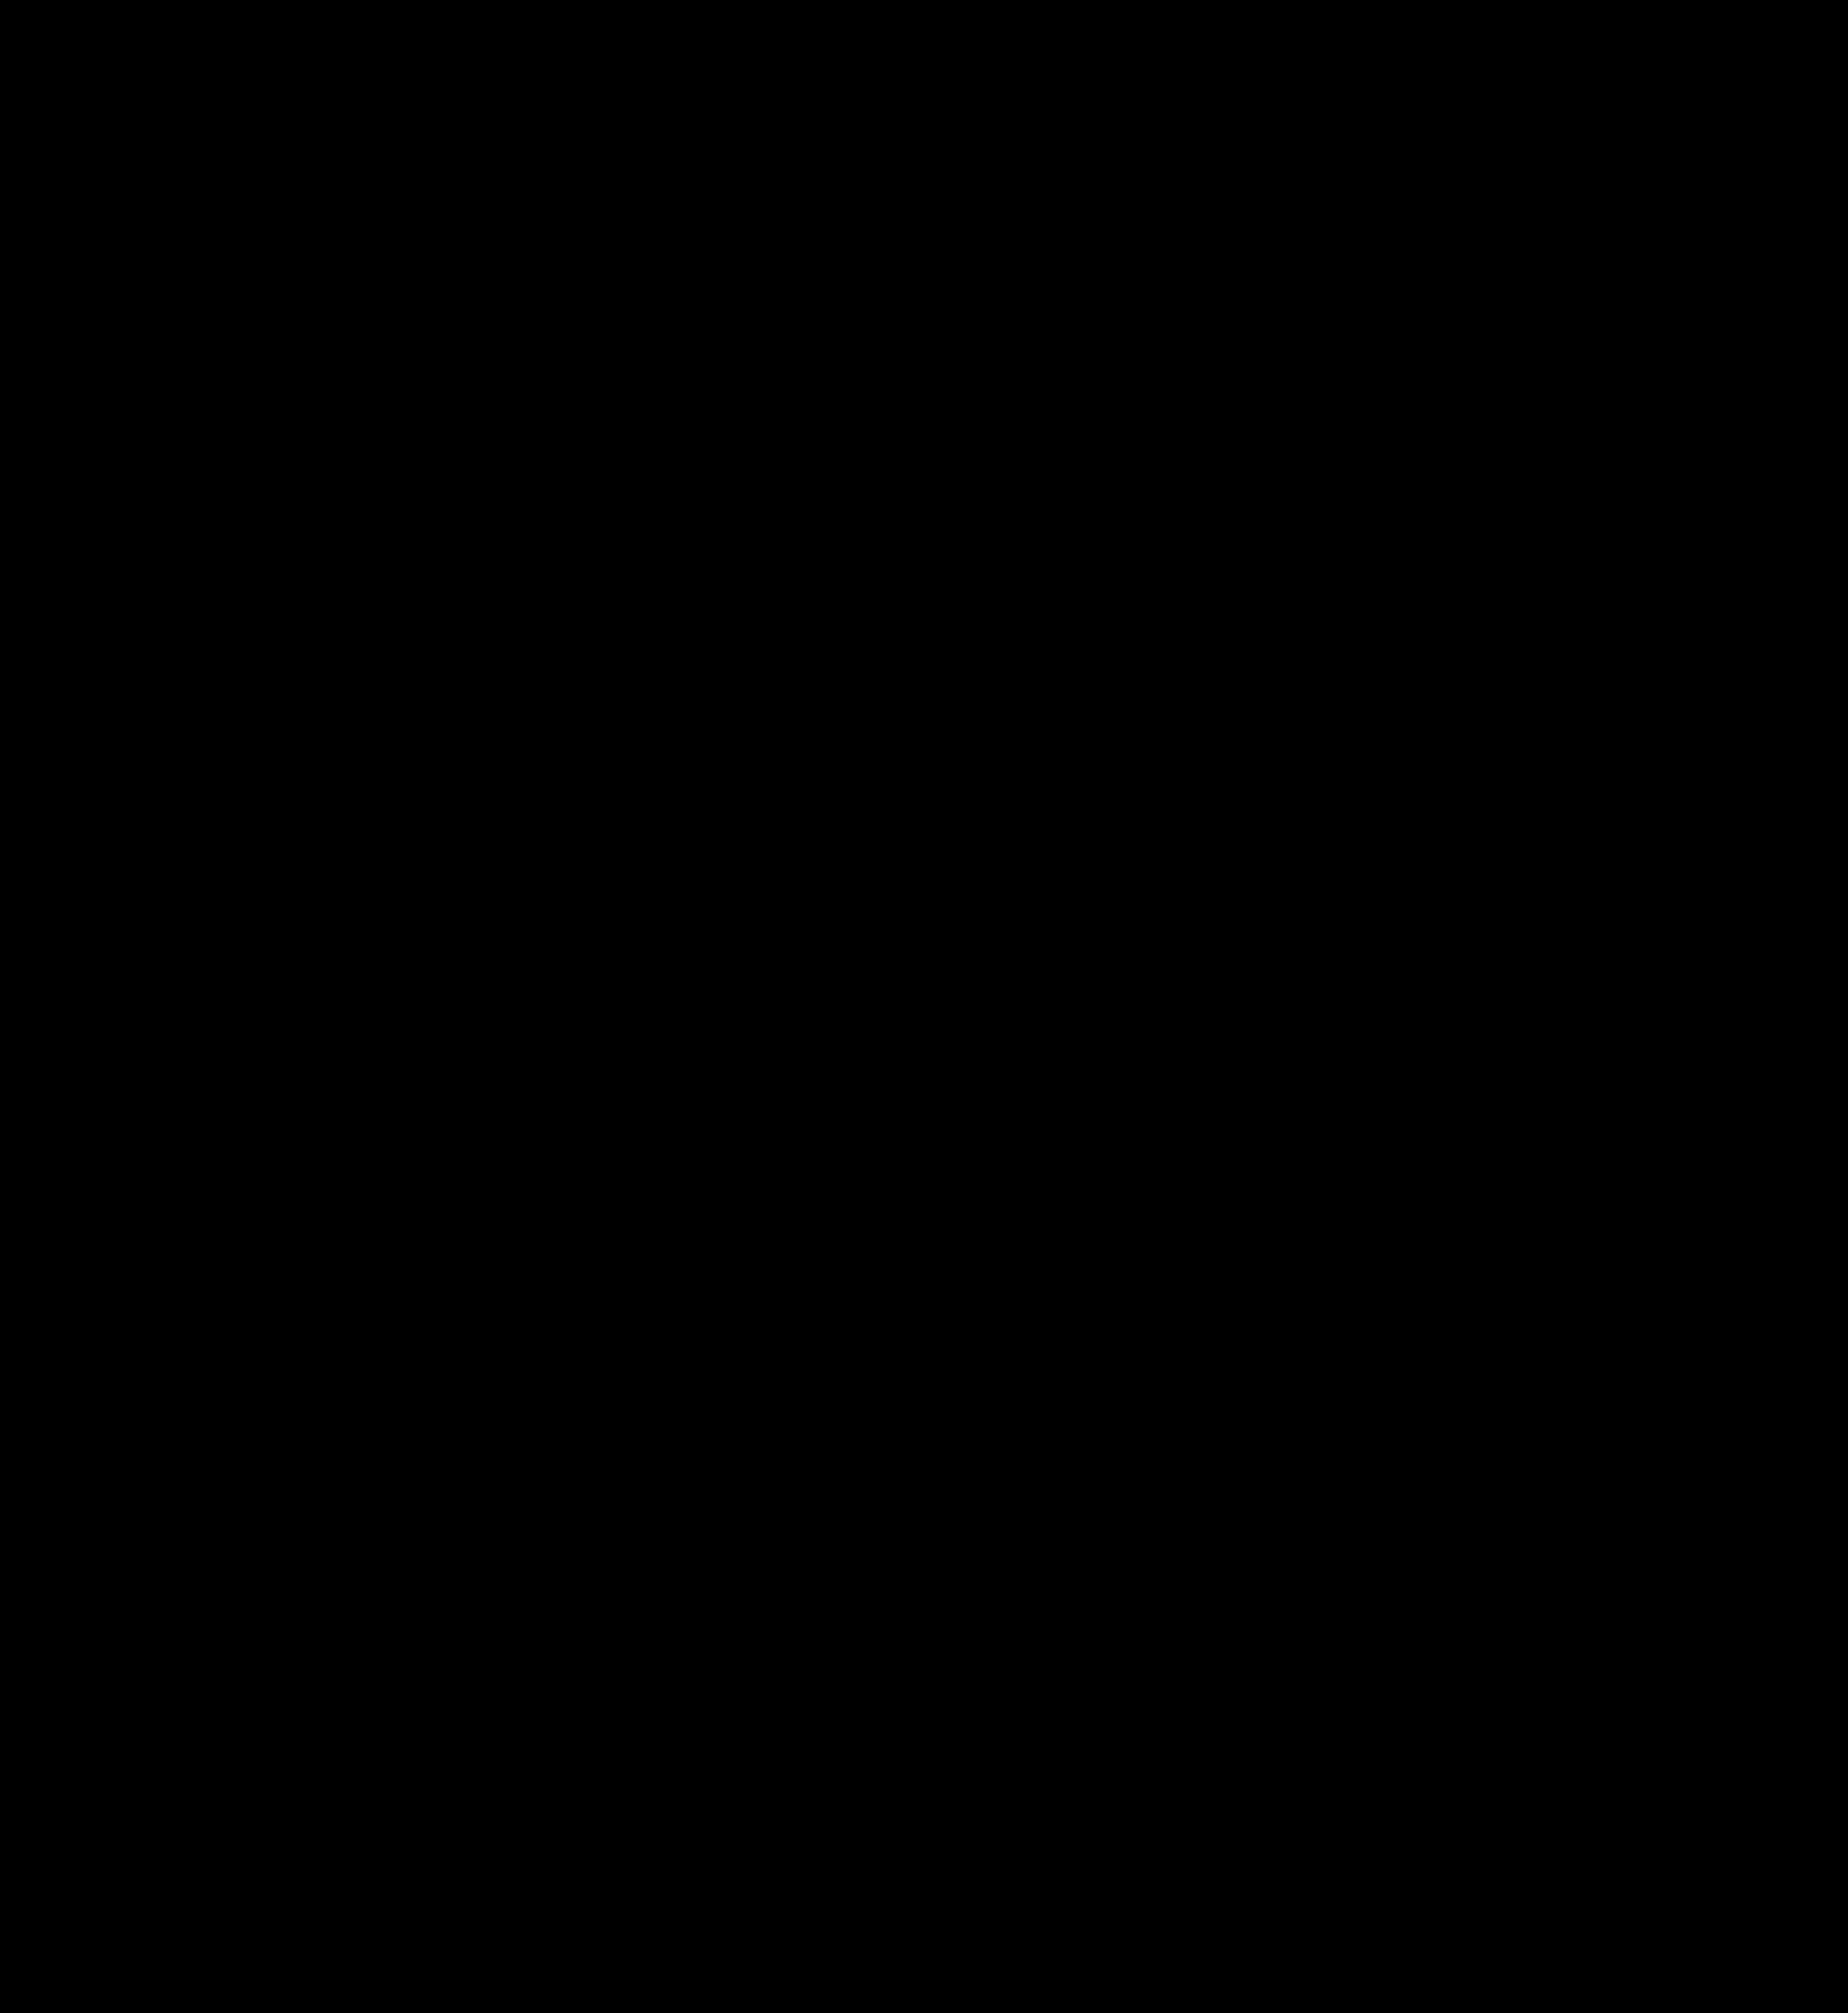 jol_3517-5